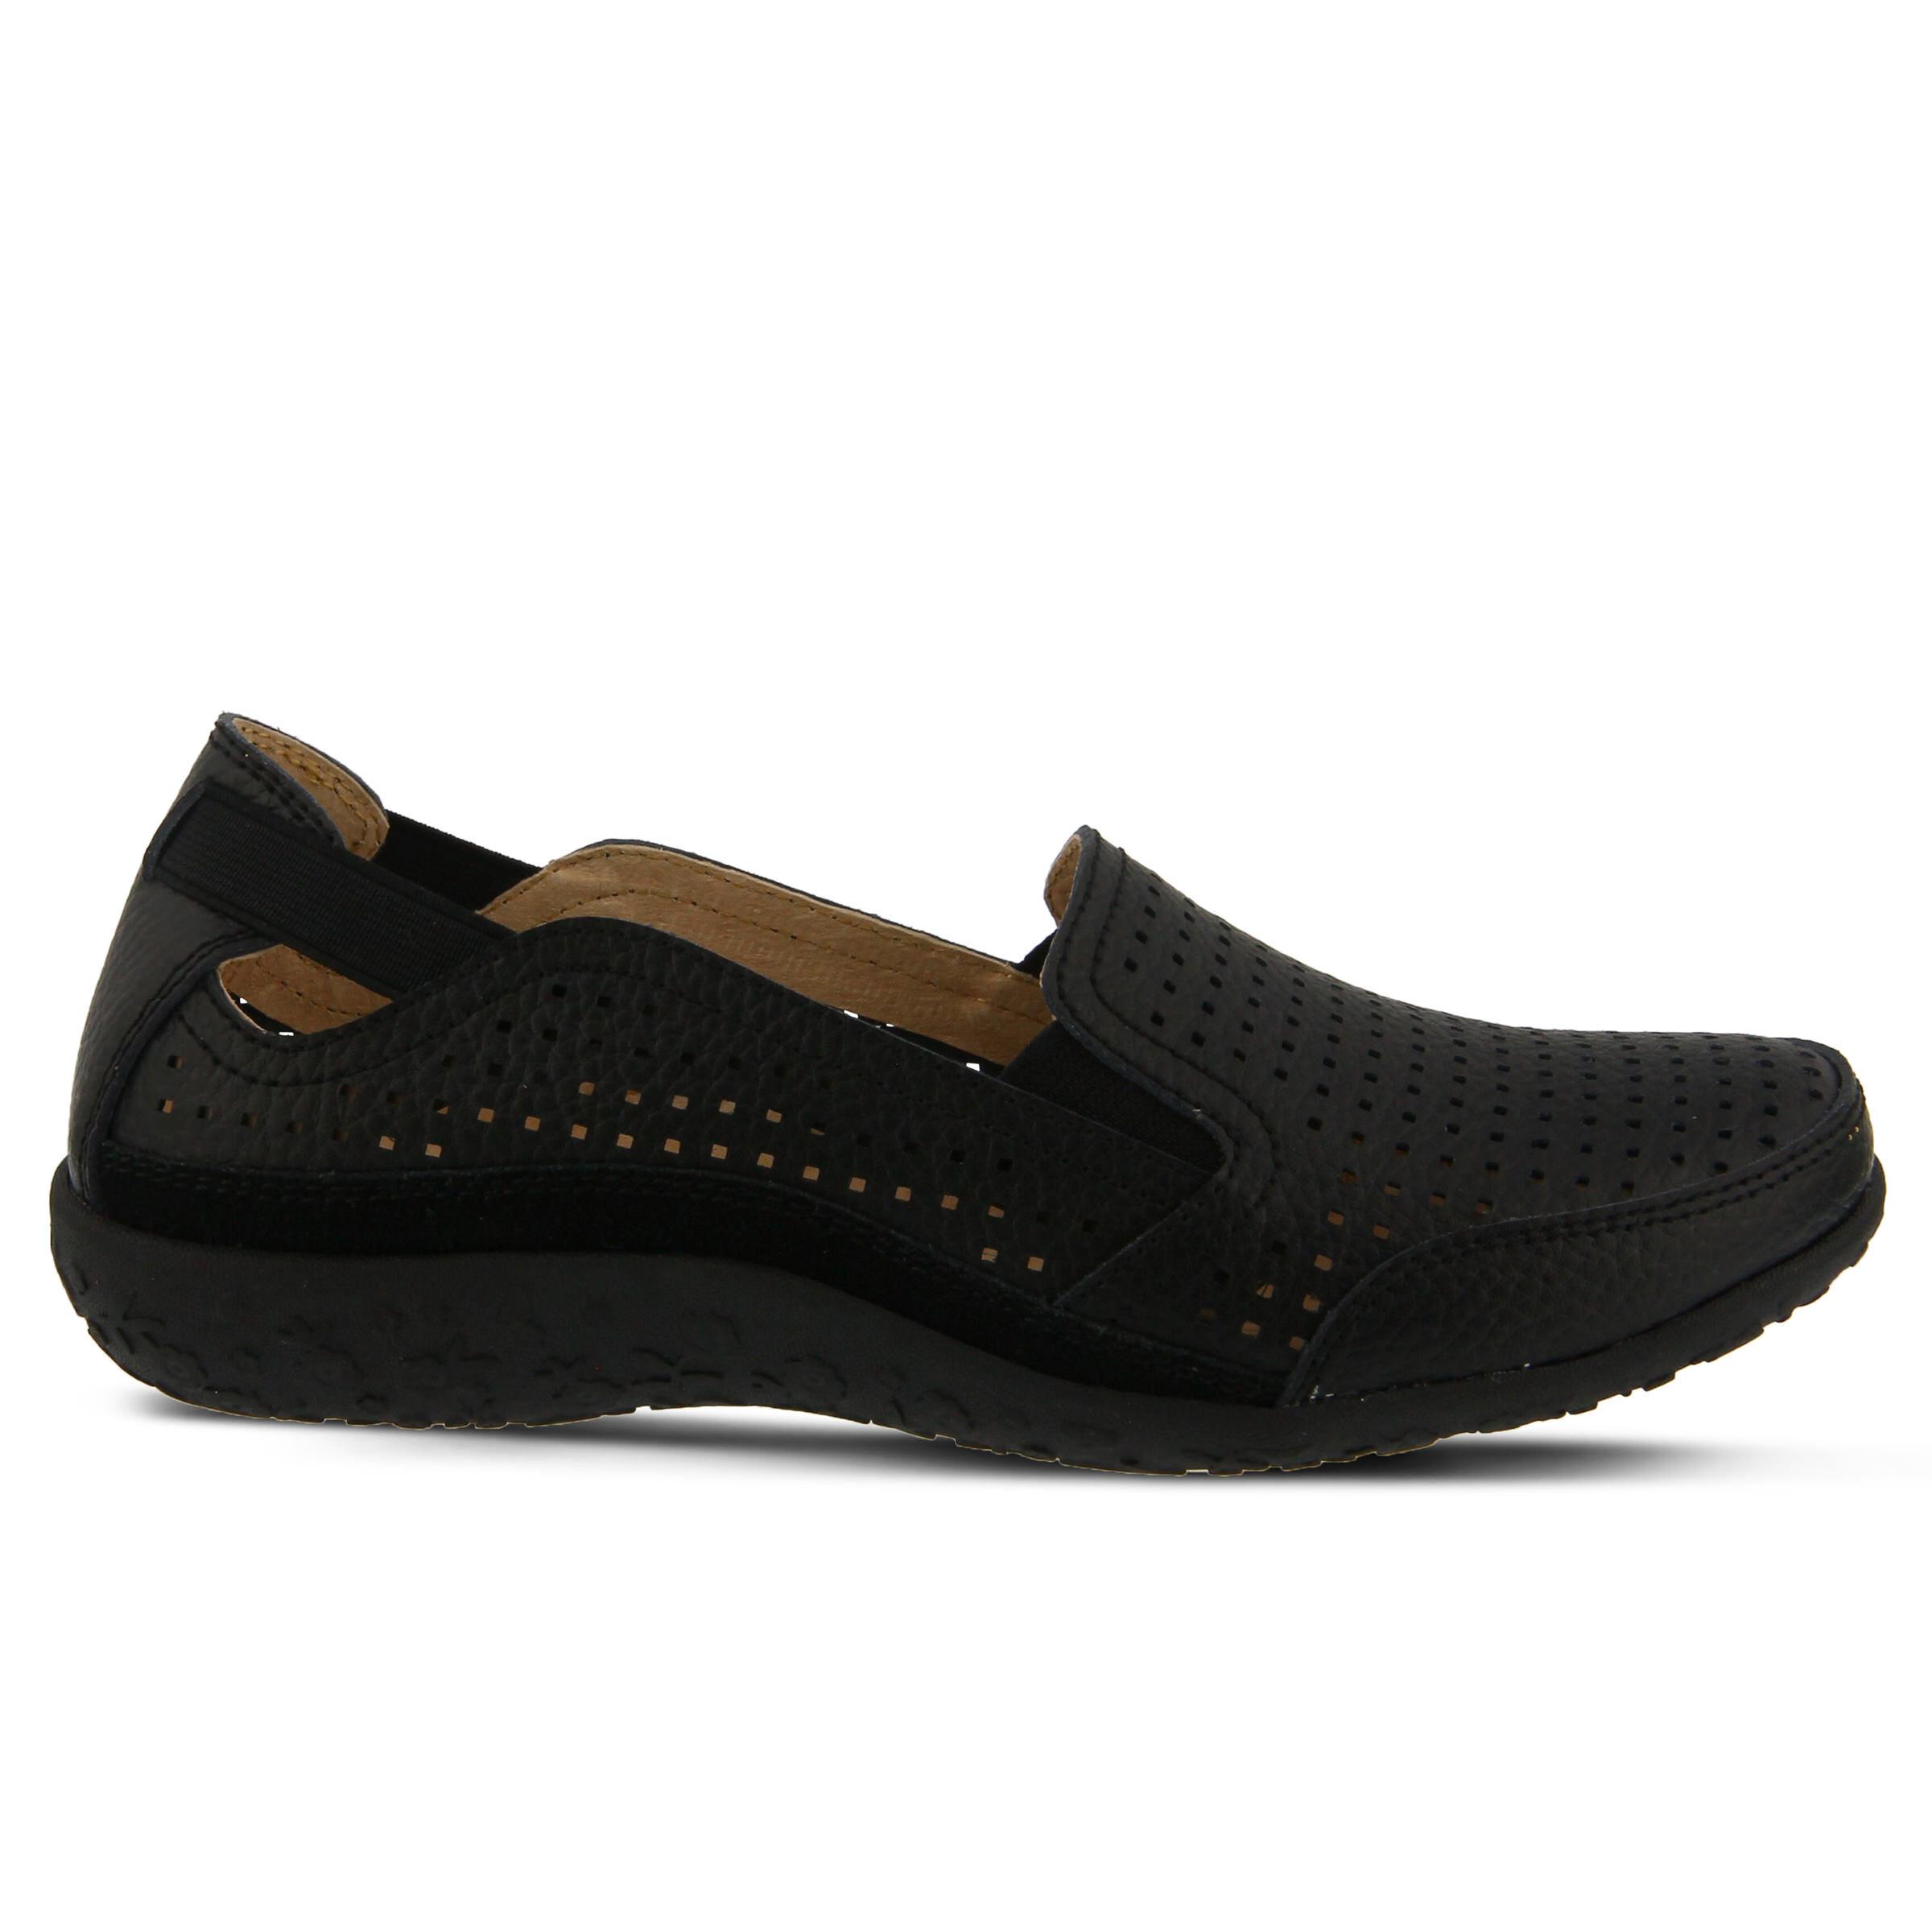 uk shoes_kd4123